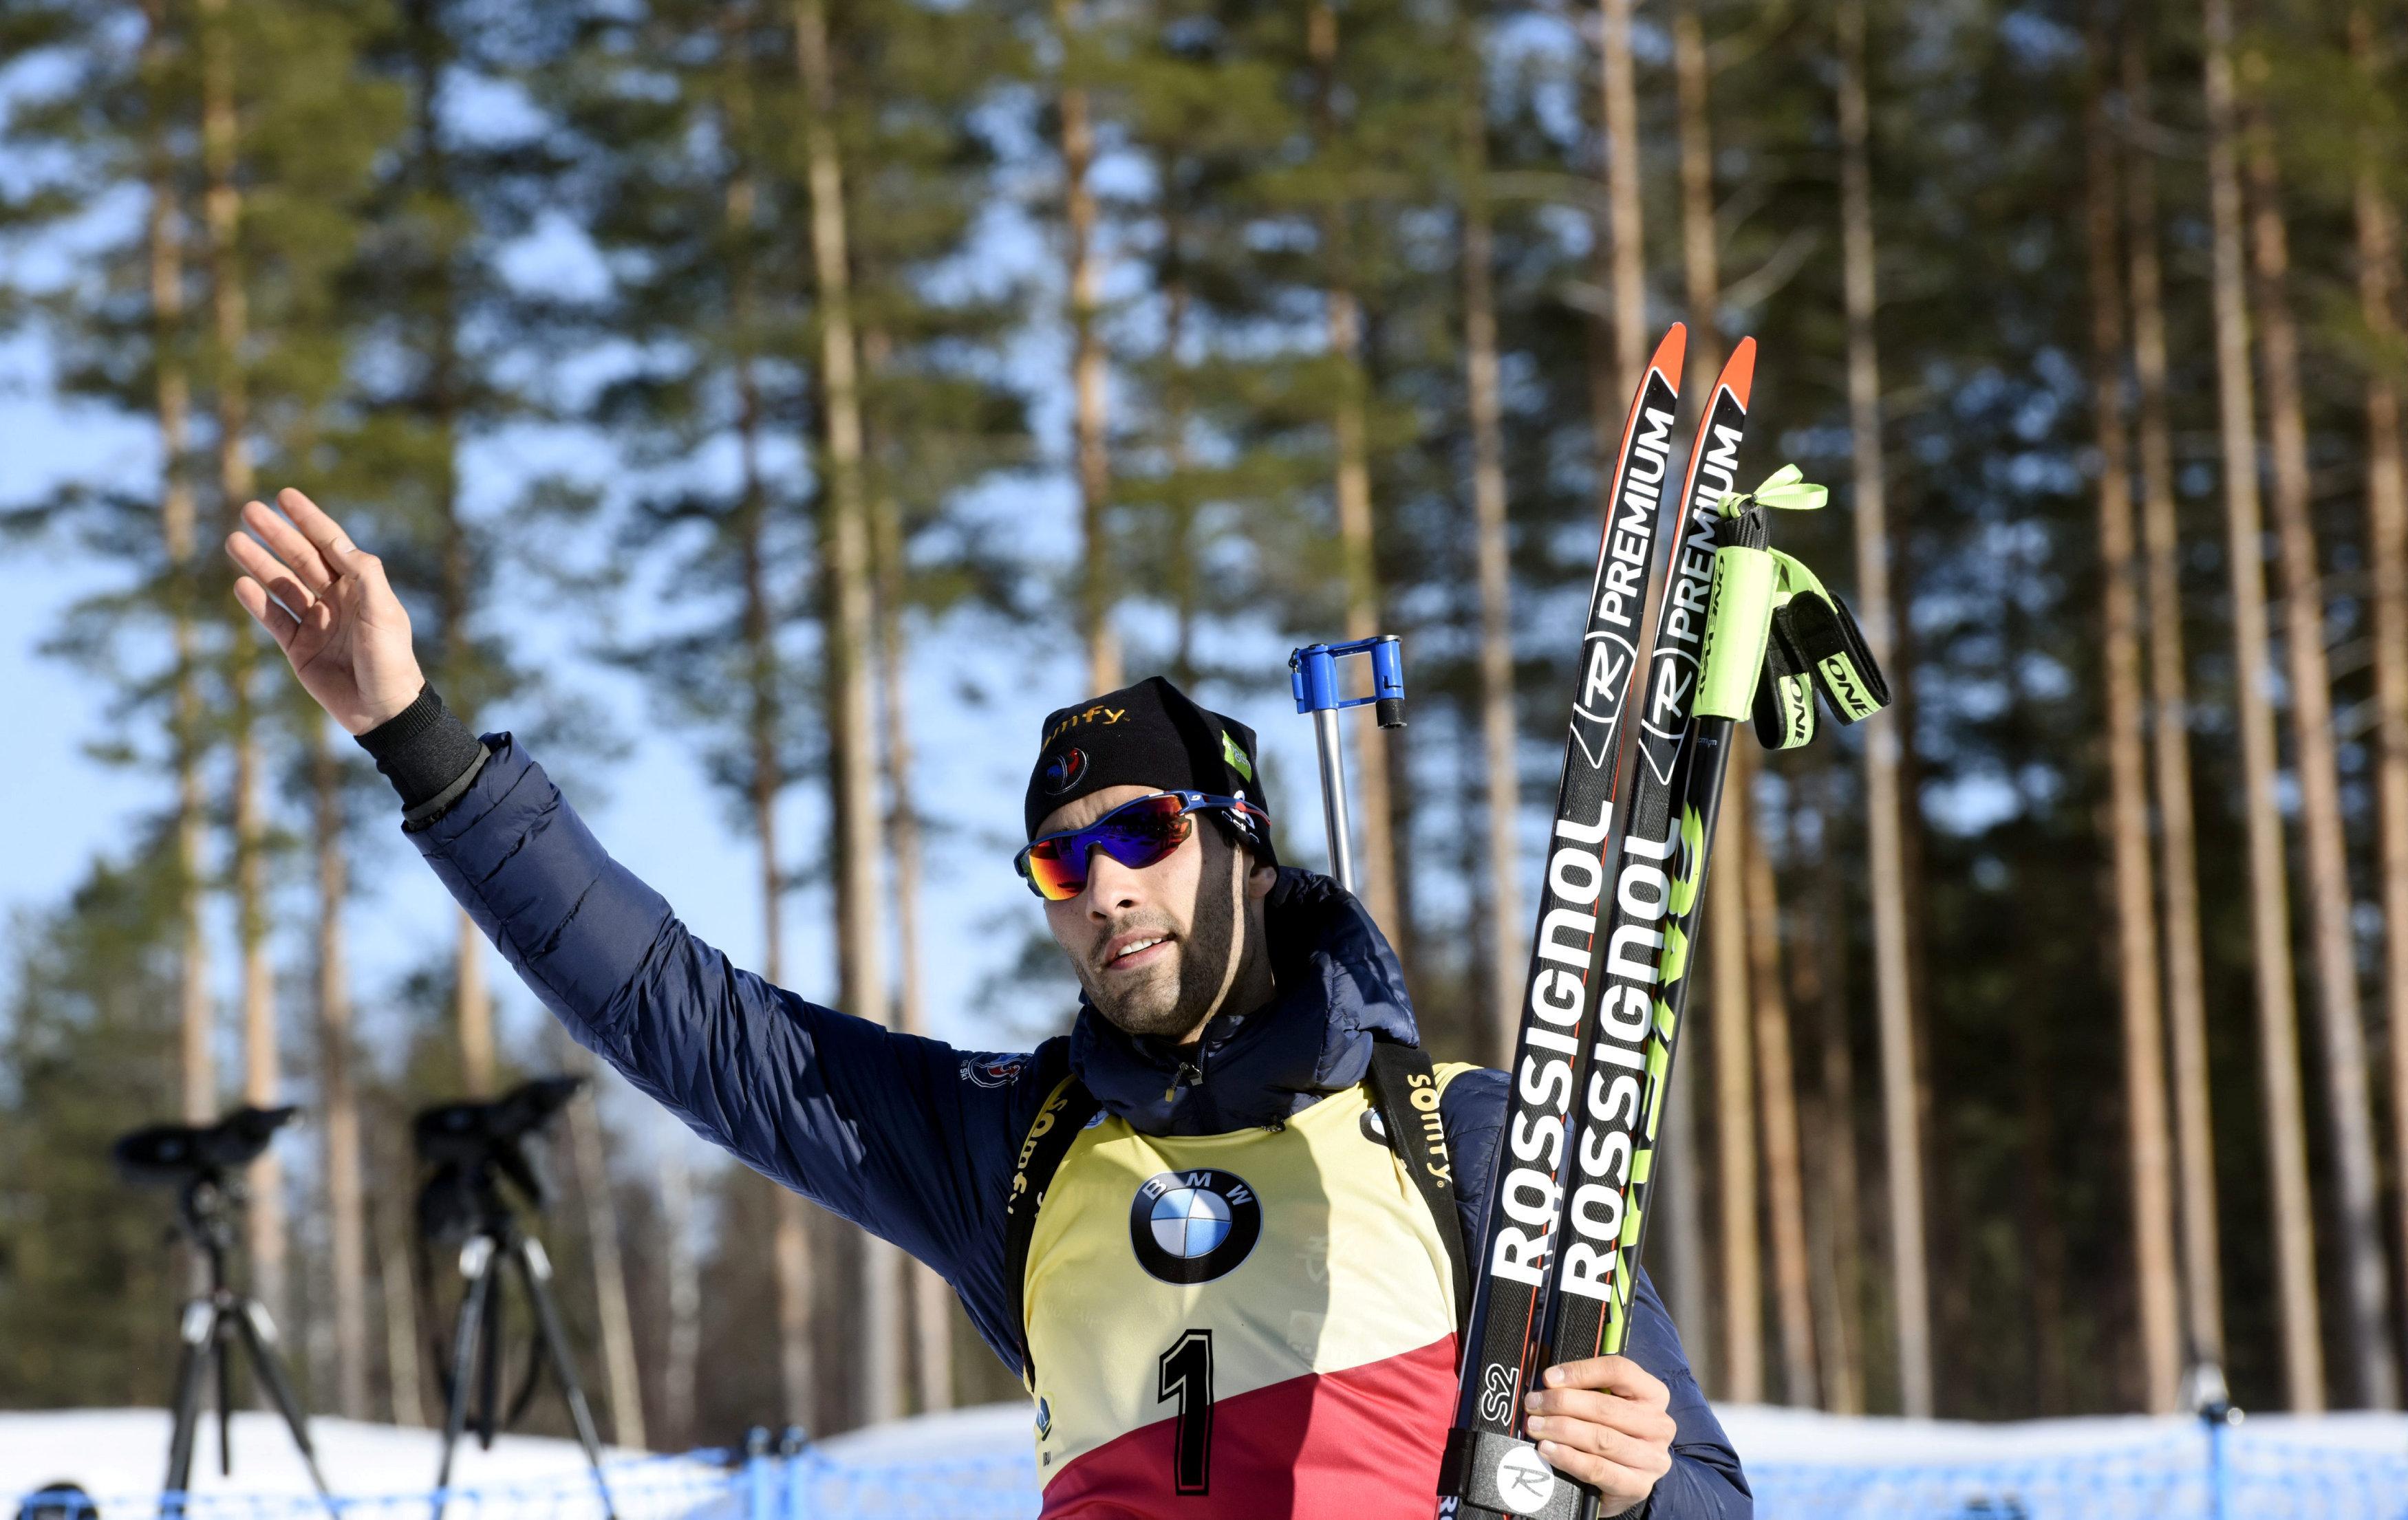 Французский биатлонист Мартен Фуркад преждевременно завершил сезон